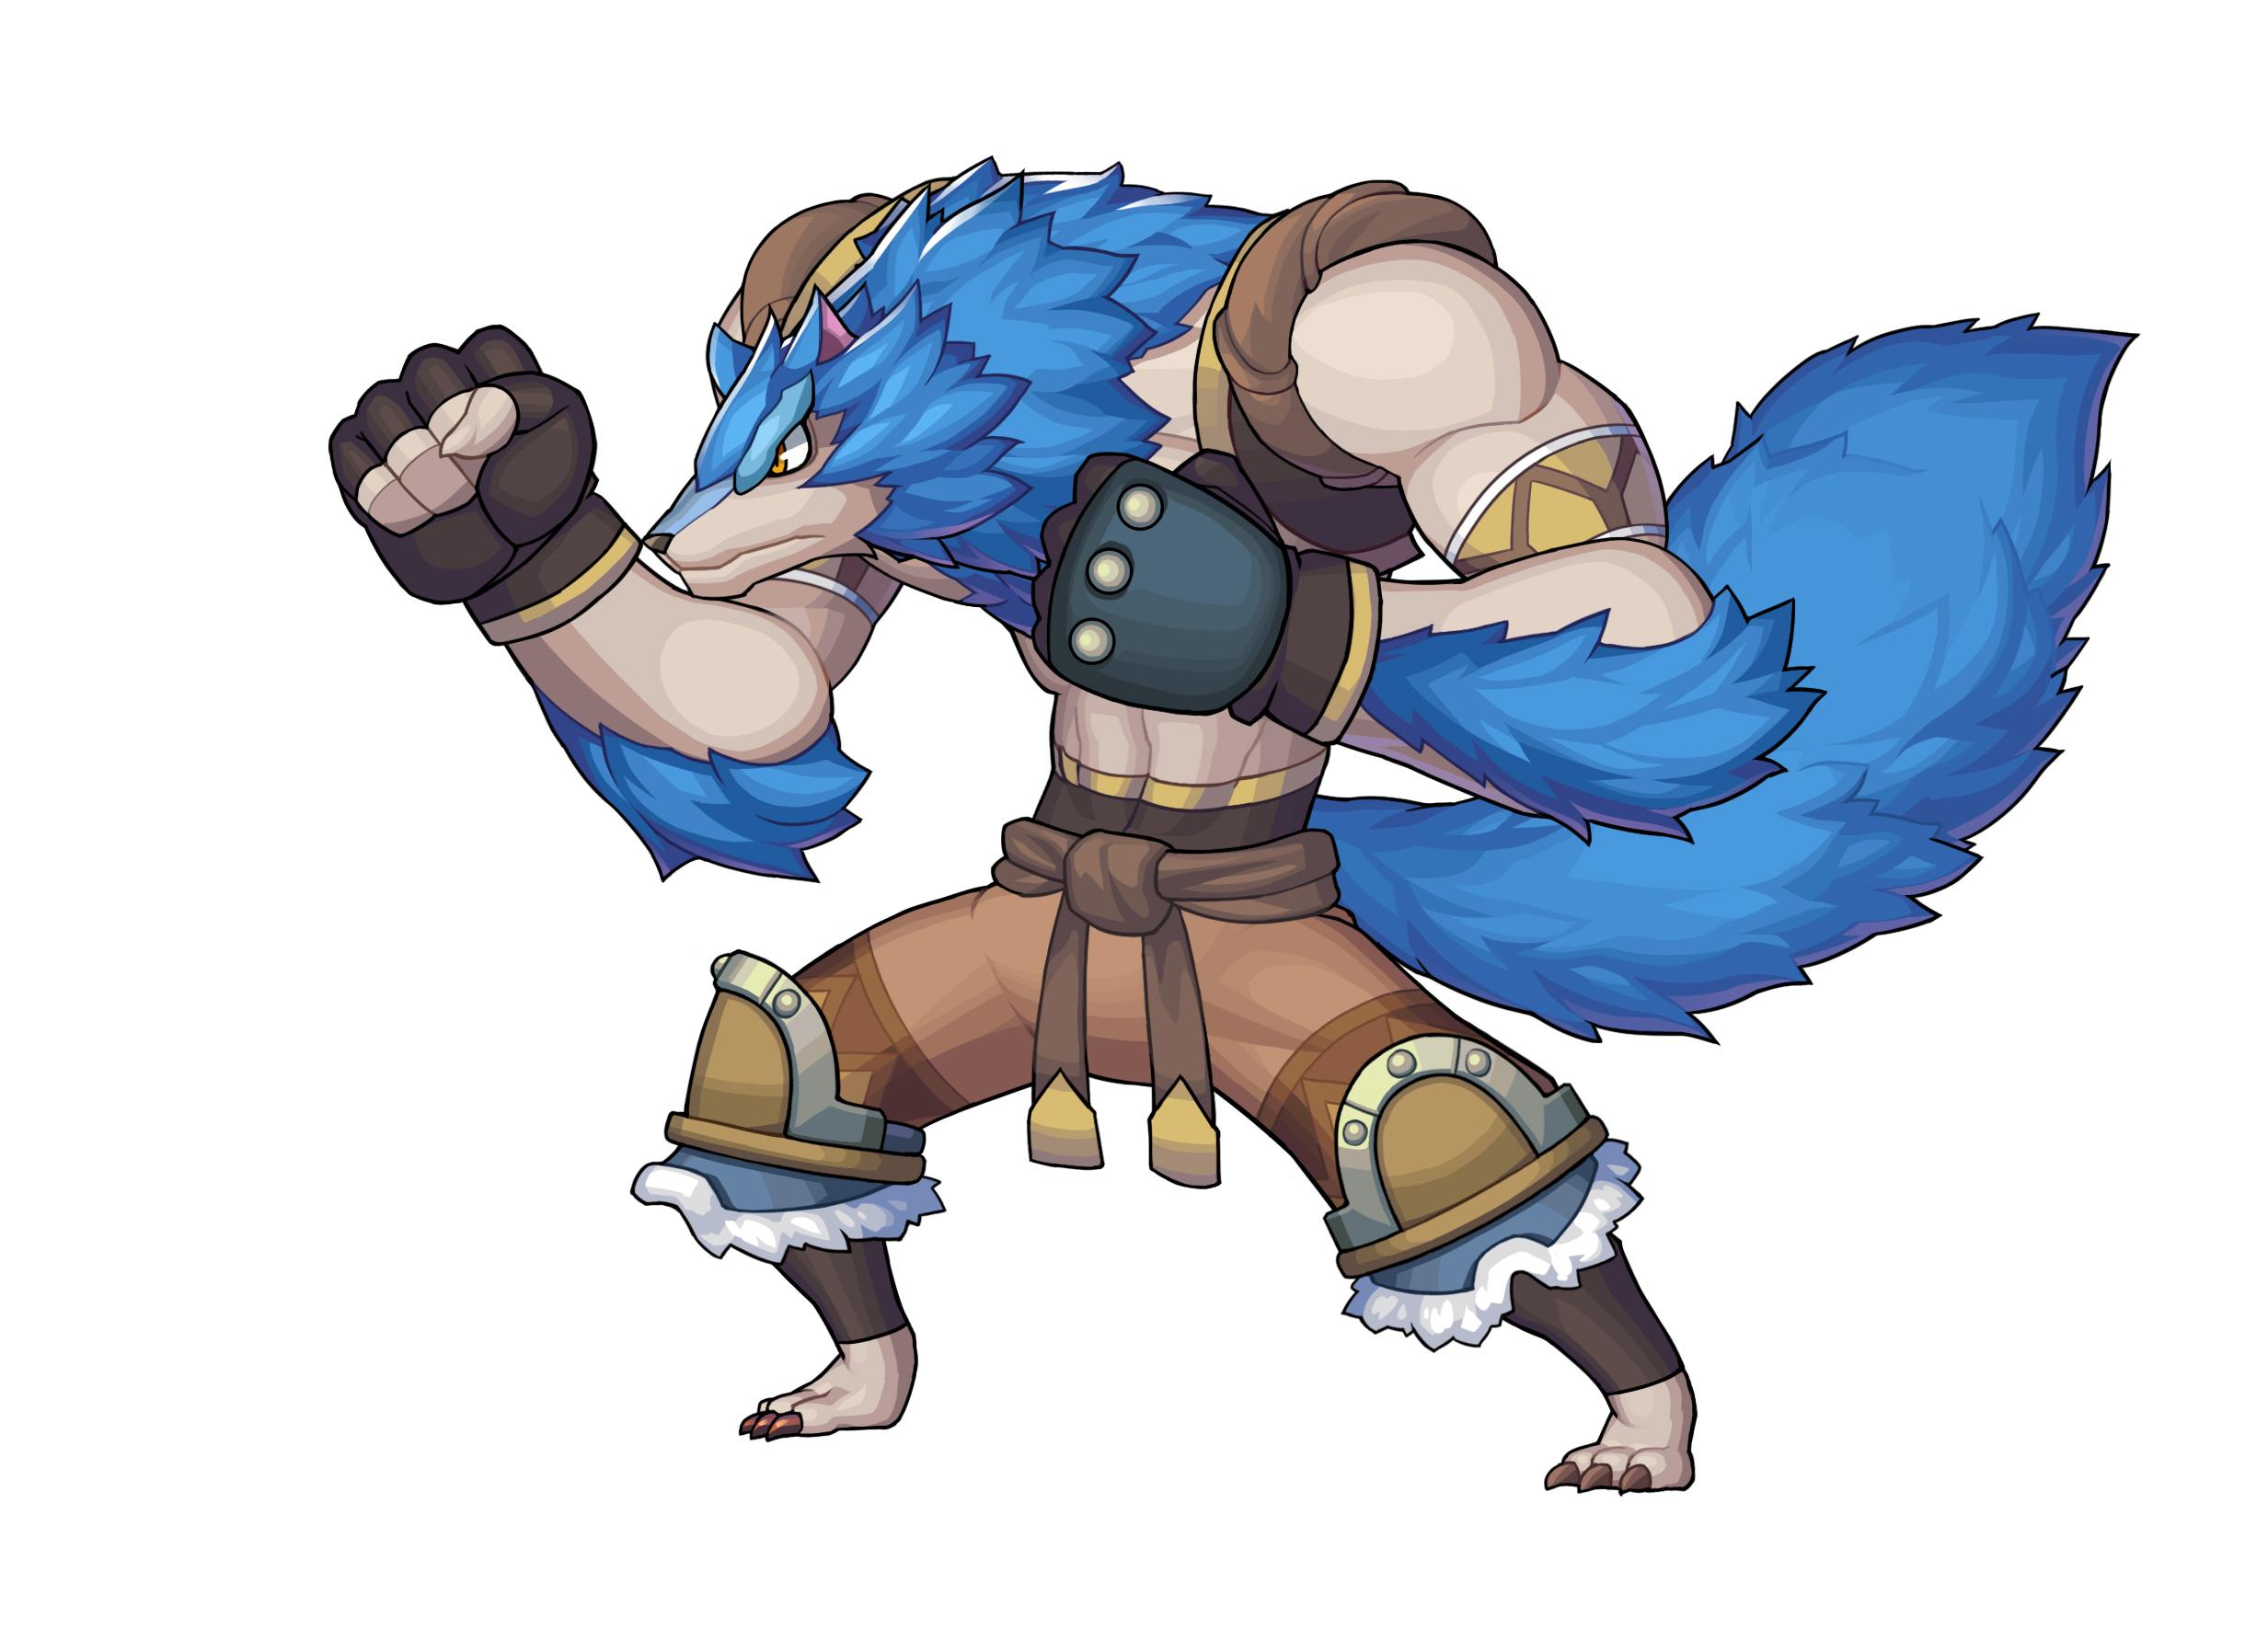 "<strong class="""">「ウルバ族」</strong><br class="""">大陸各地に広く根付いている獣人の中でもオオカミに似た特徴を持つ獣人族。黒や茶色などの毛並みを持った亜種も存在する。ウルバ族は力強い体躯と優れた身体能力を備えその拳から繰り出す打撃は他種族が振るう剣になんら遜色ない威力を発揮する"